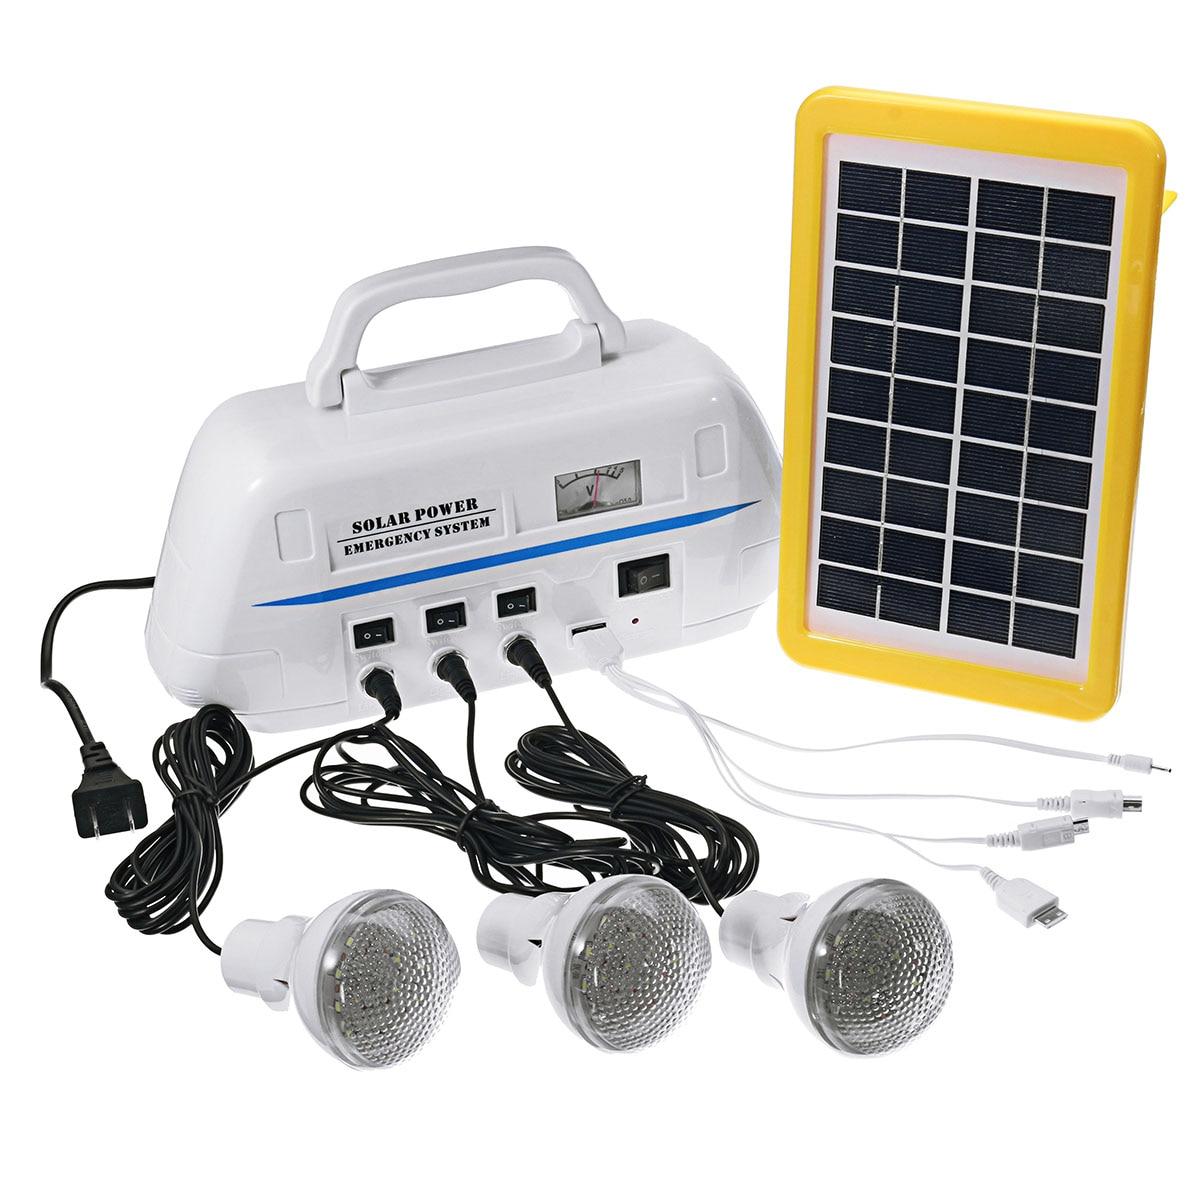 Smuxi Solar Powered Outdoor Camping Music Lantern High Quality Flashlight For Emergency Light Hand Hiking Lighting